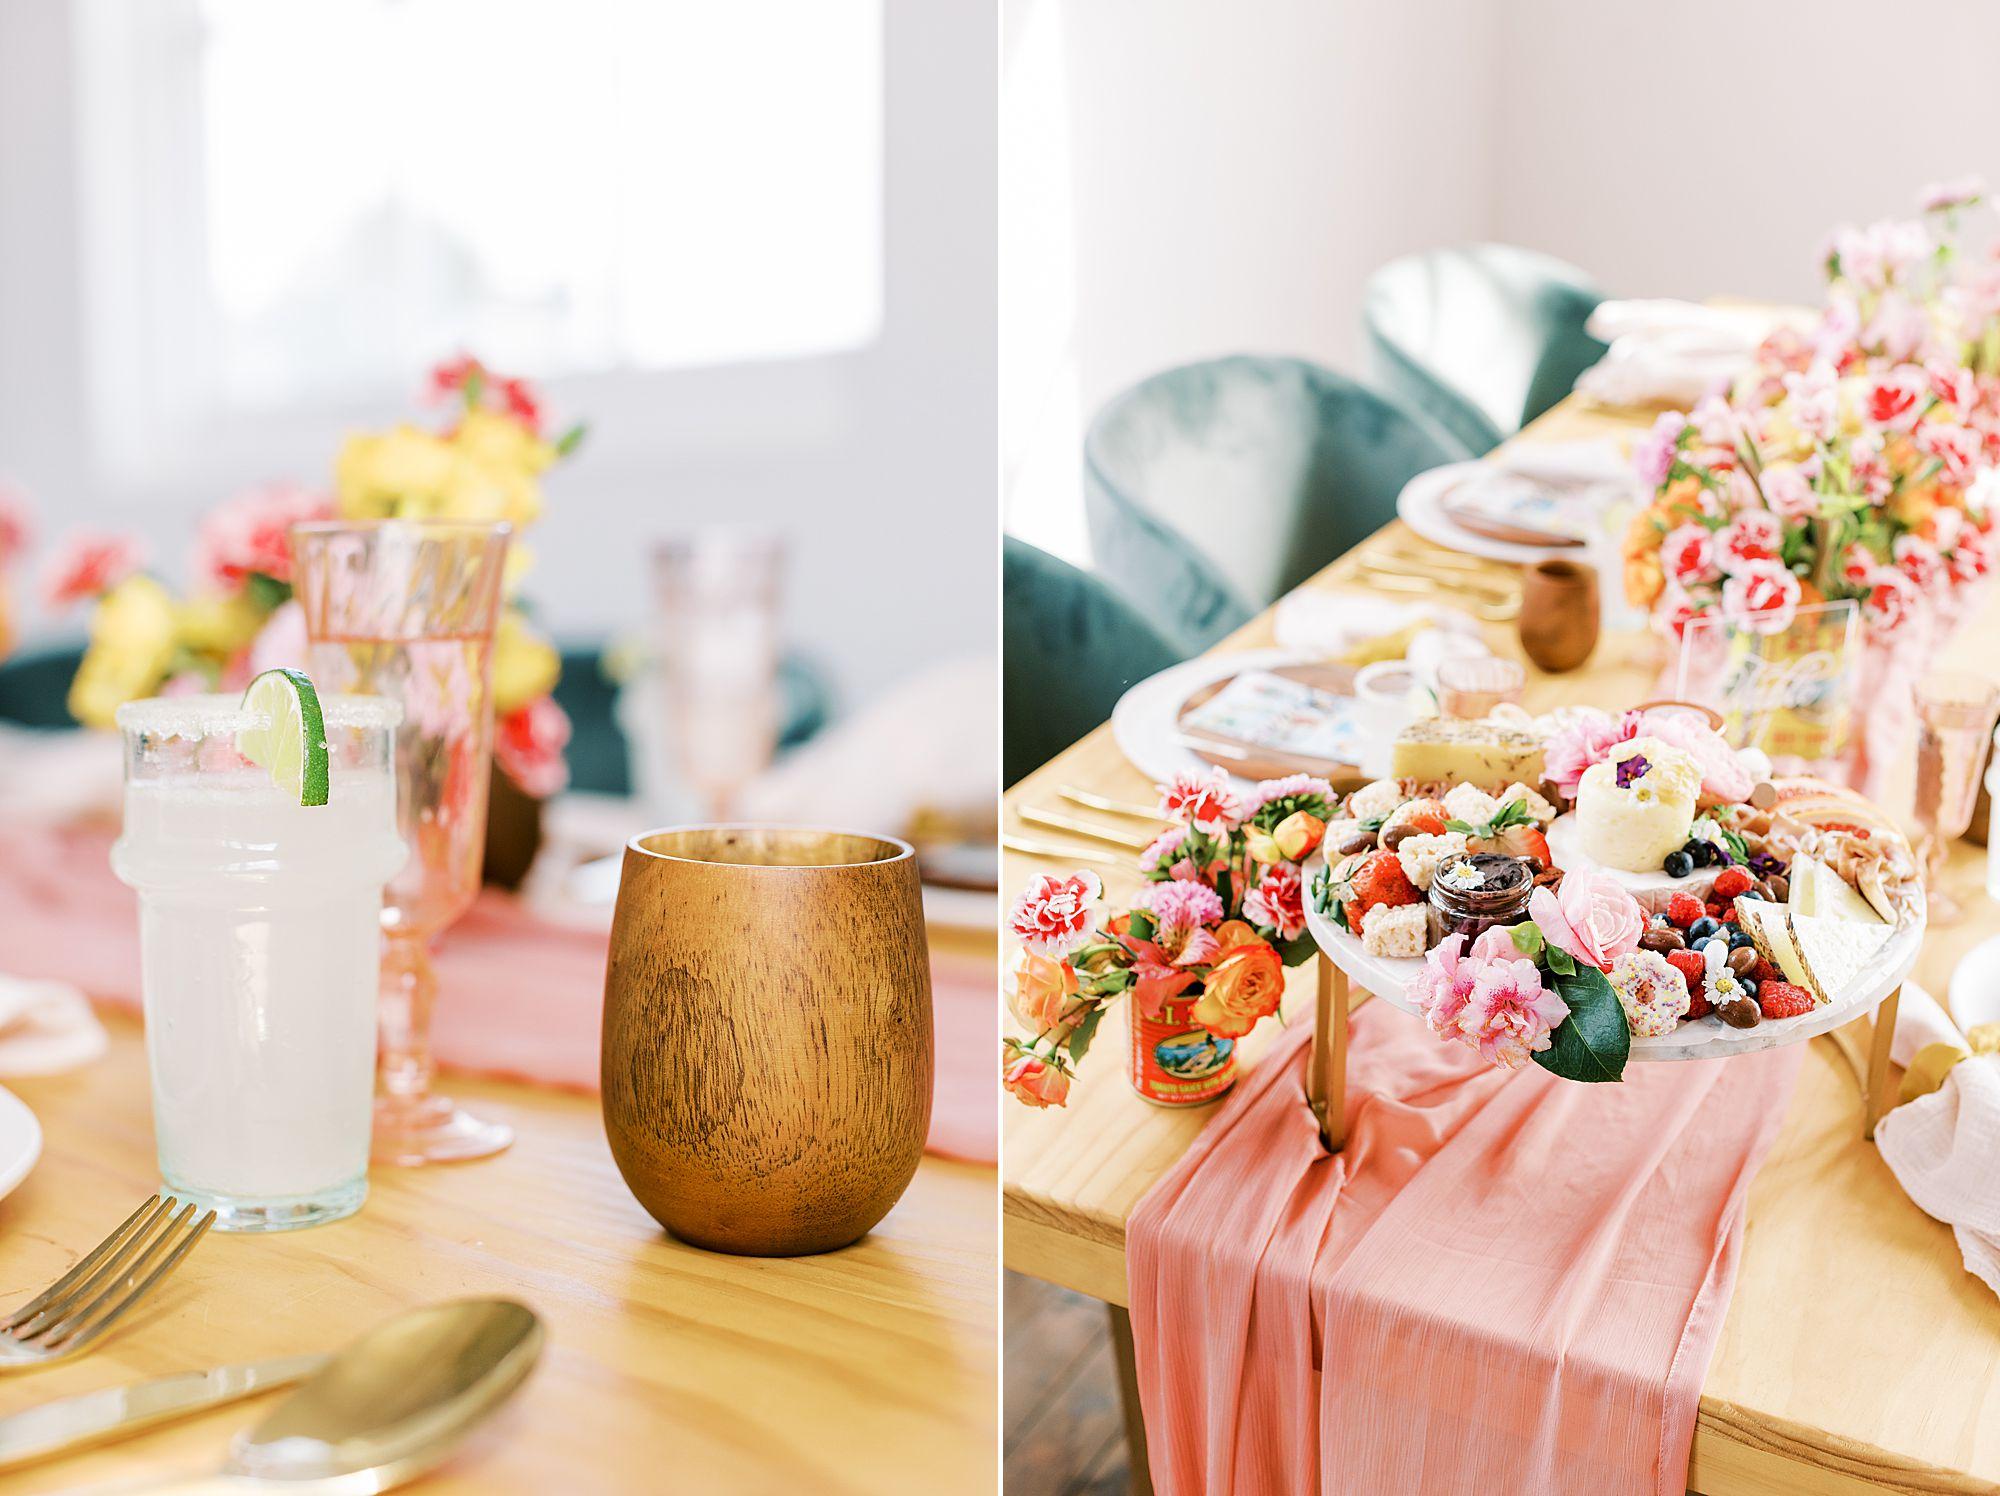 Cinco De Mayo Inspiration for Your FIesta - Party Crush Studio and Ashley Baumgartner_0048.jpg